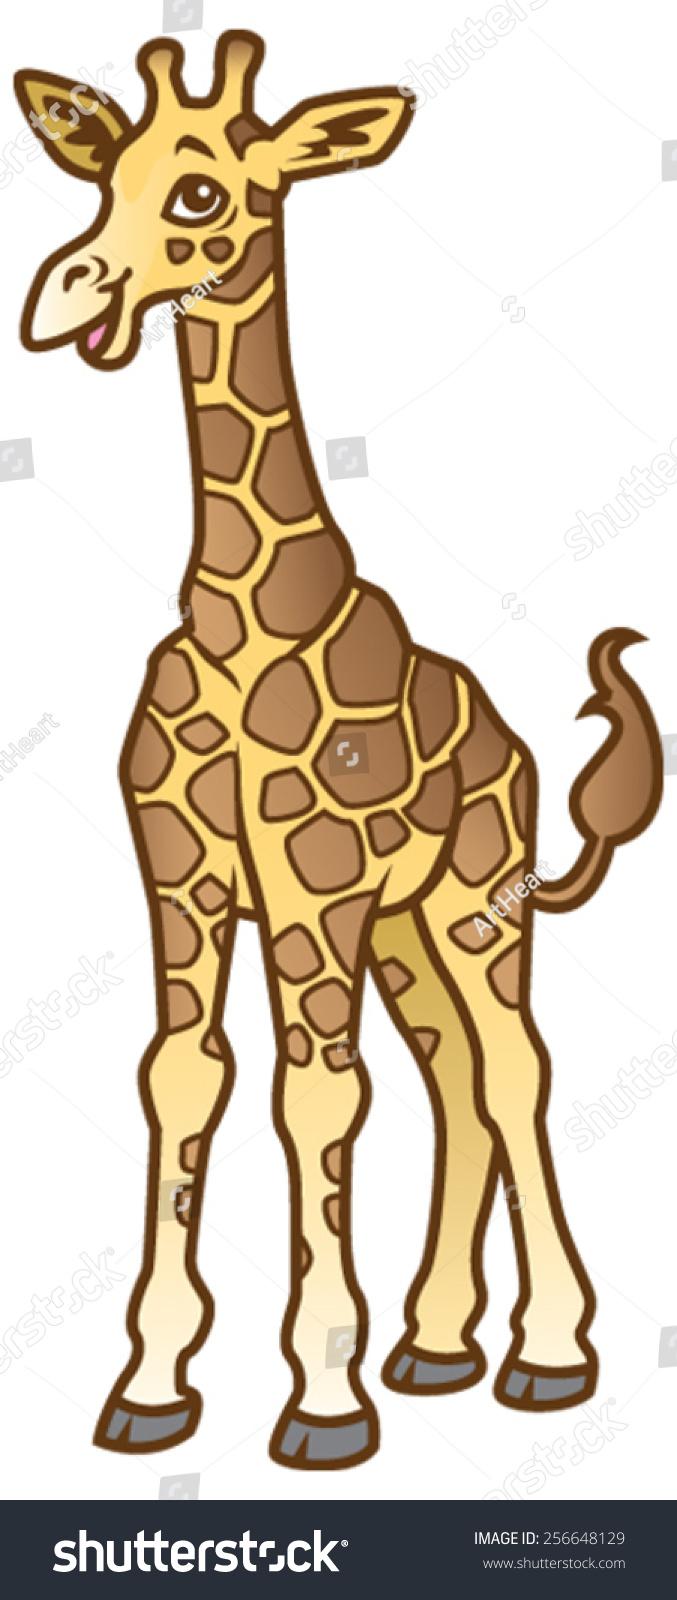 Cute Baby Giraffe Drawing : giraffe, drawing, Cartoon, Drawing, Giraffe, Stock, Vector, (Royalty, Free), 256648129